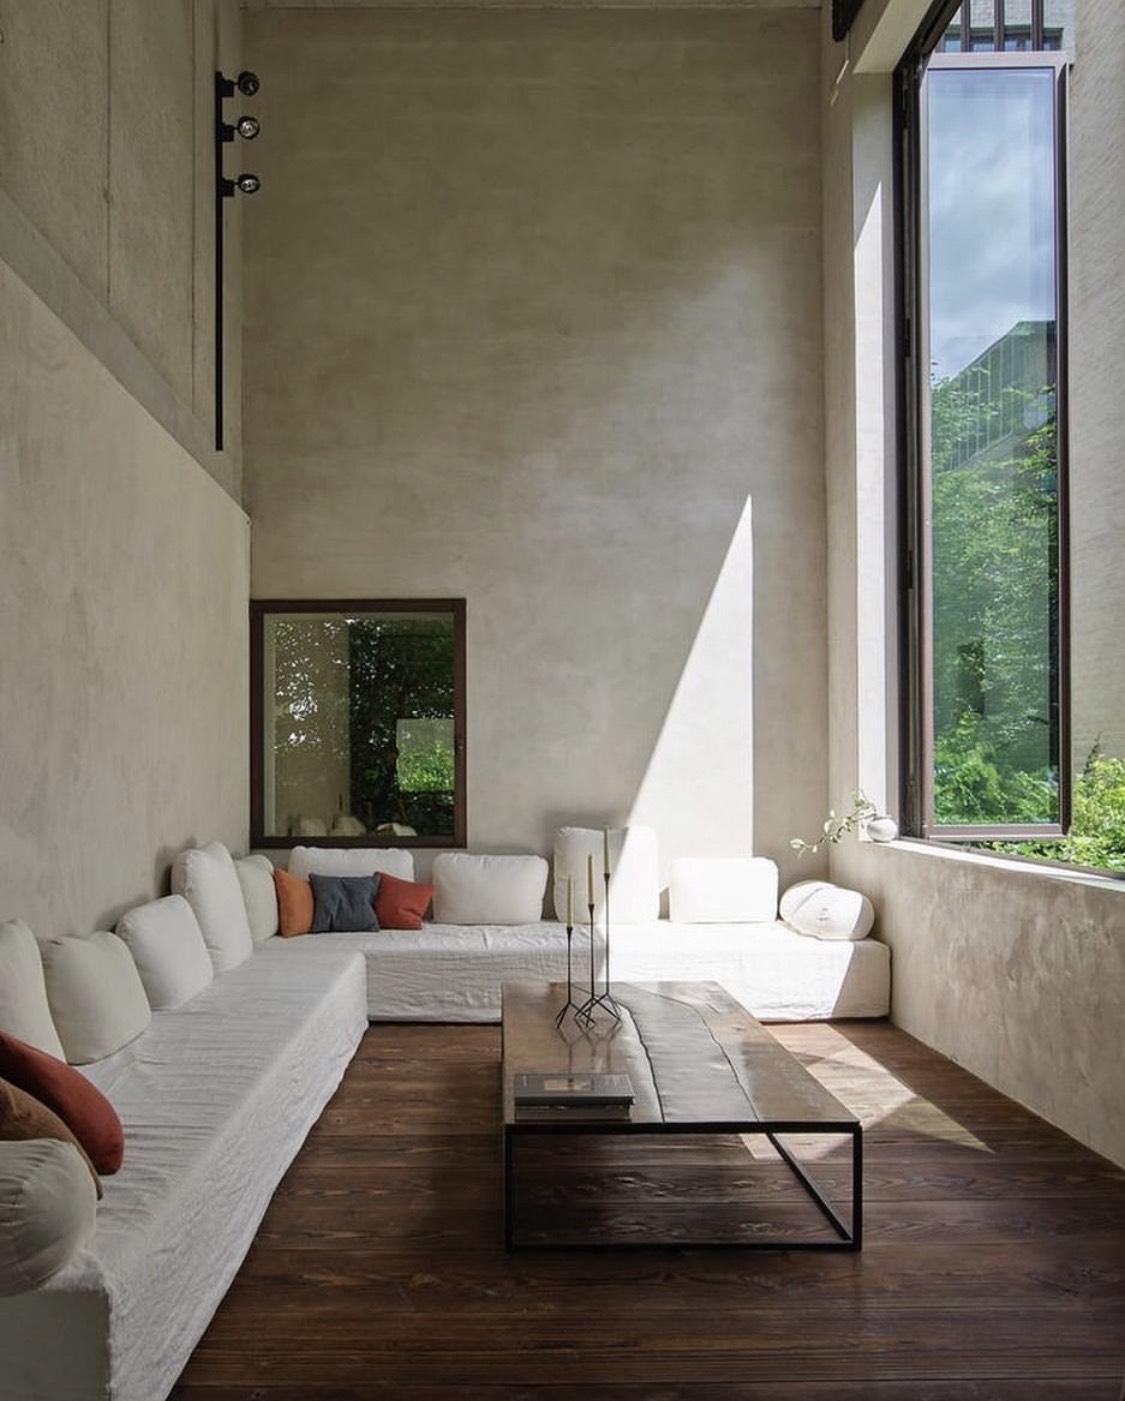 Space designed by Axel Vervoordt